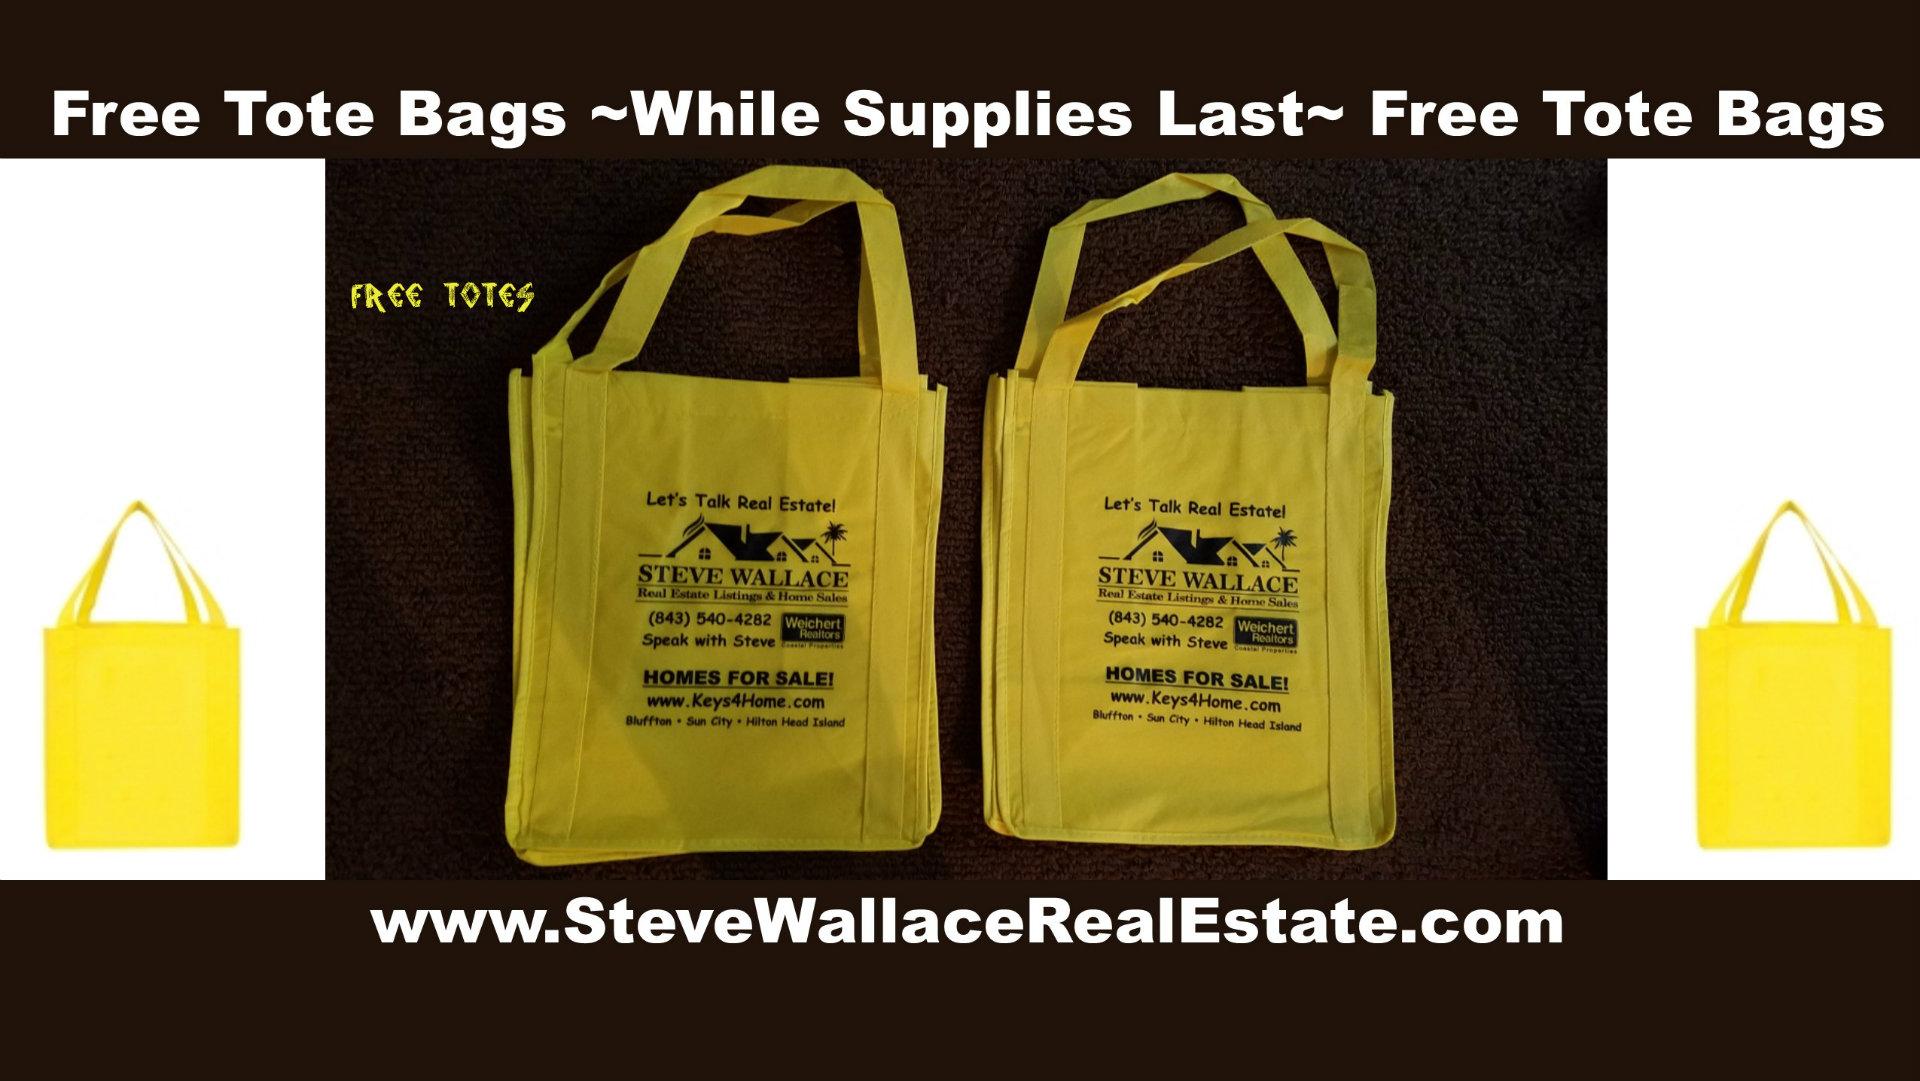 single use, plastic bag ban, bluffton, sc, environment, reusable, free, tote bag